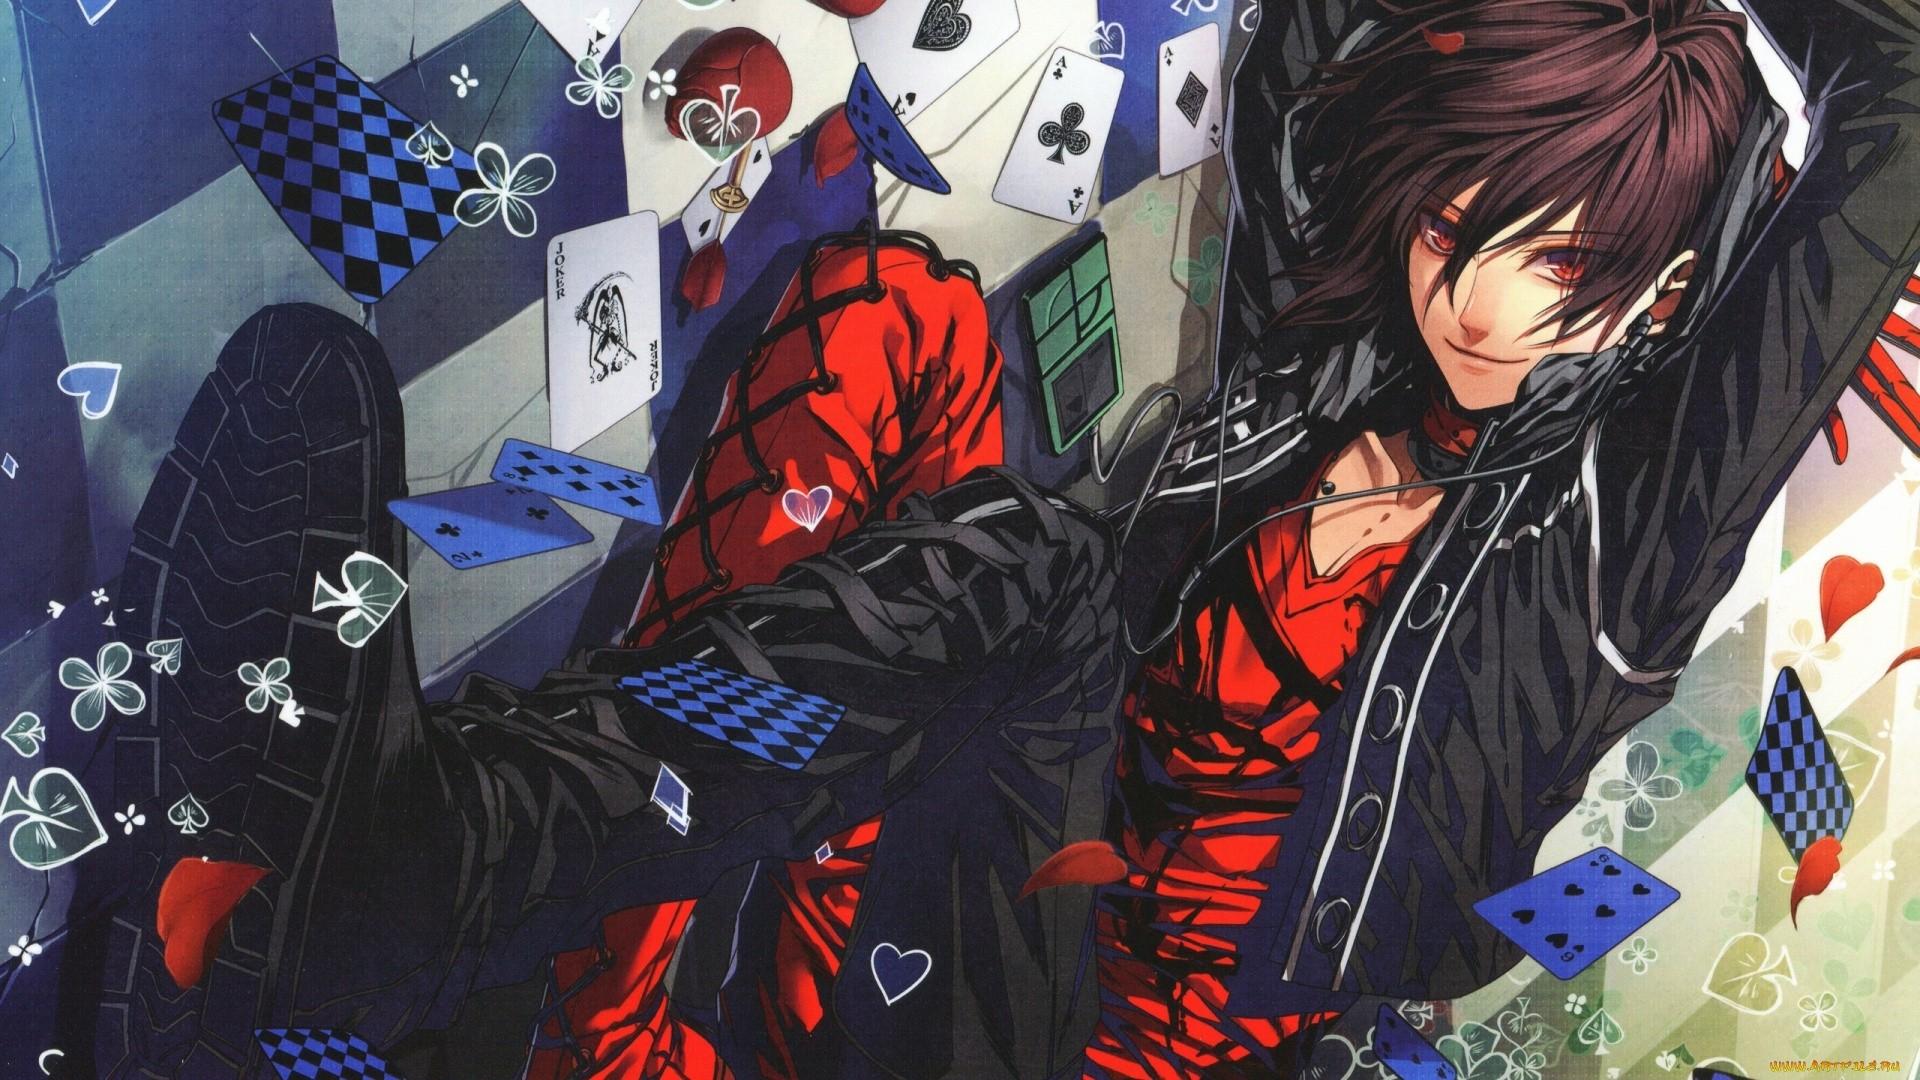 Anime Boy Background Wallpaper